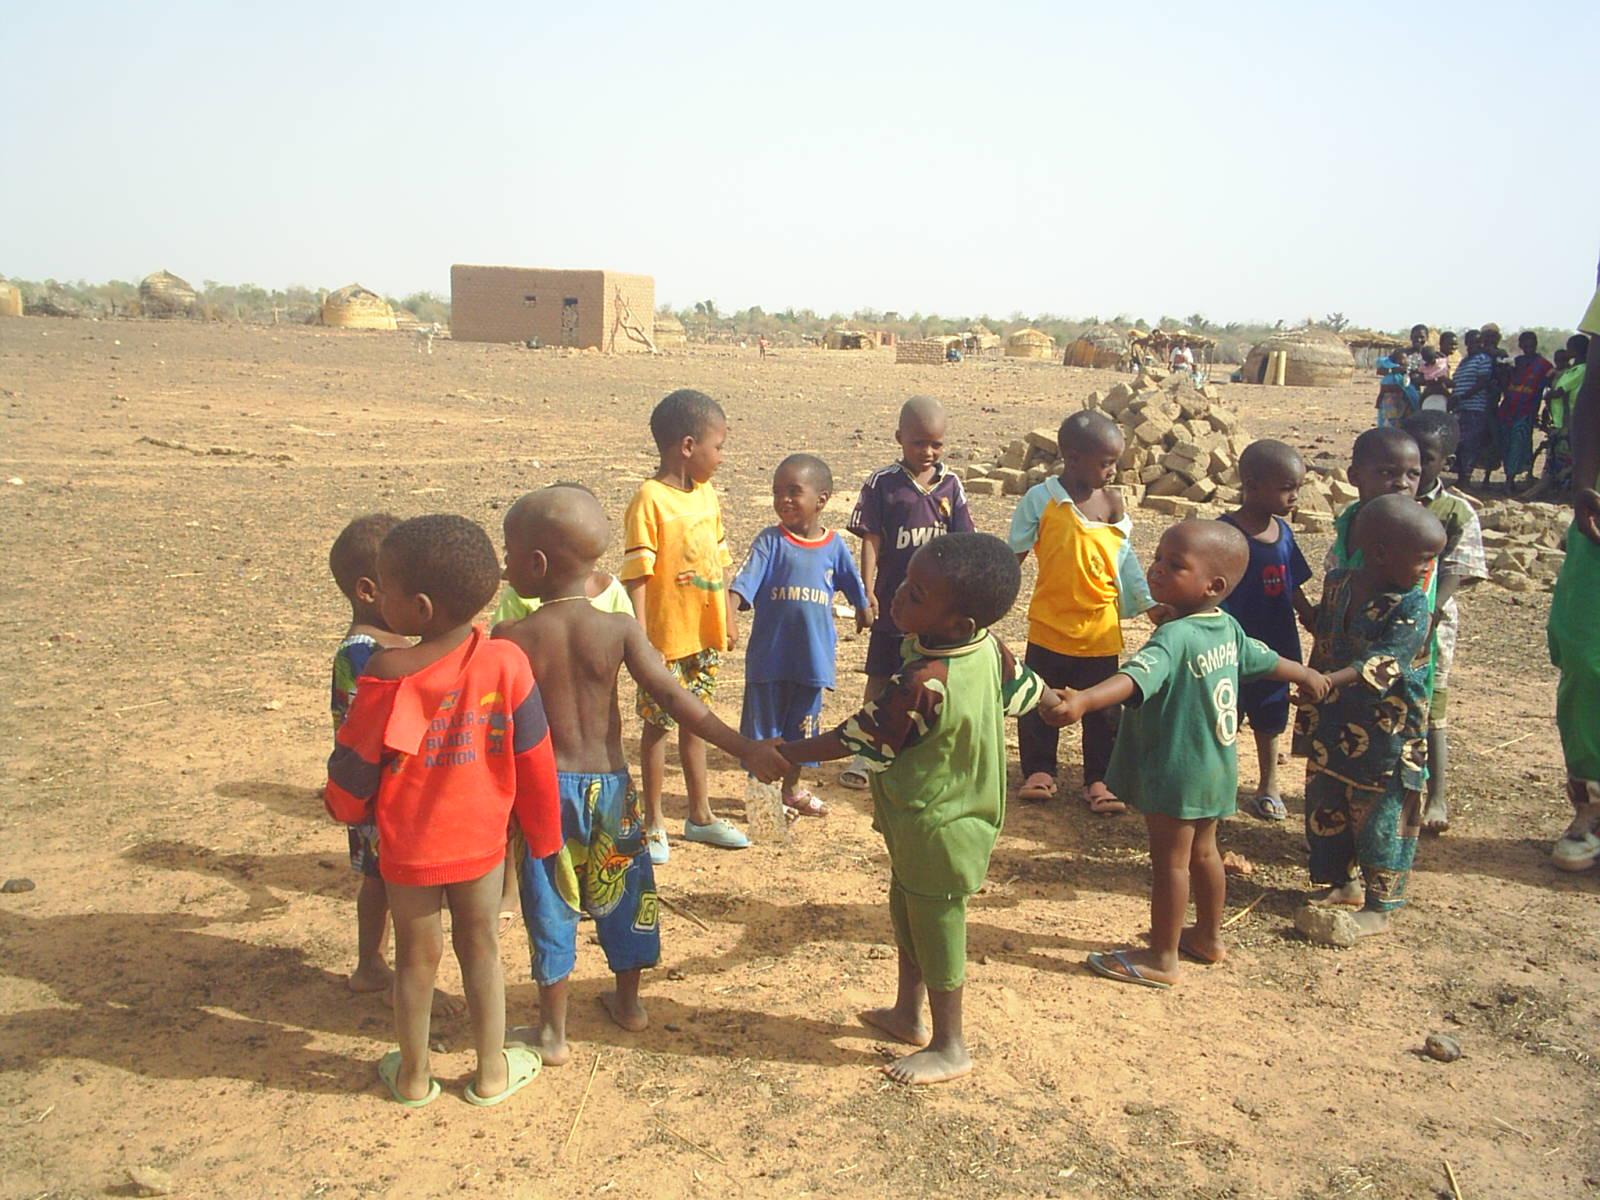 #AE541D PROJETO BURKINA FASO: Projeto Burkina Faso Tribo de Curfaye Povo  1600x1200 px projeto banheiro igreja